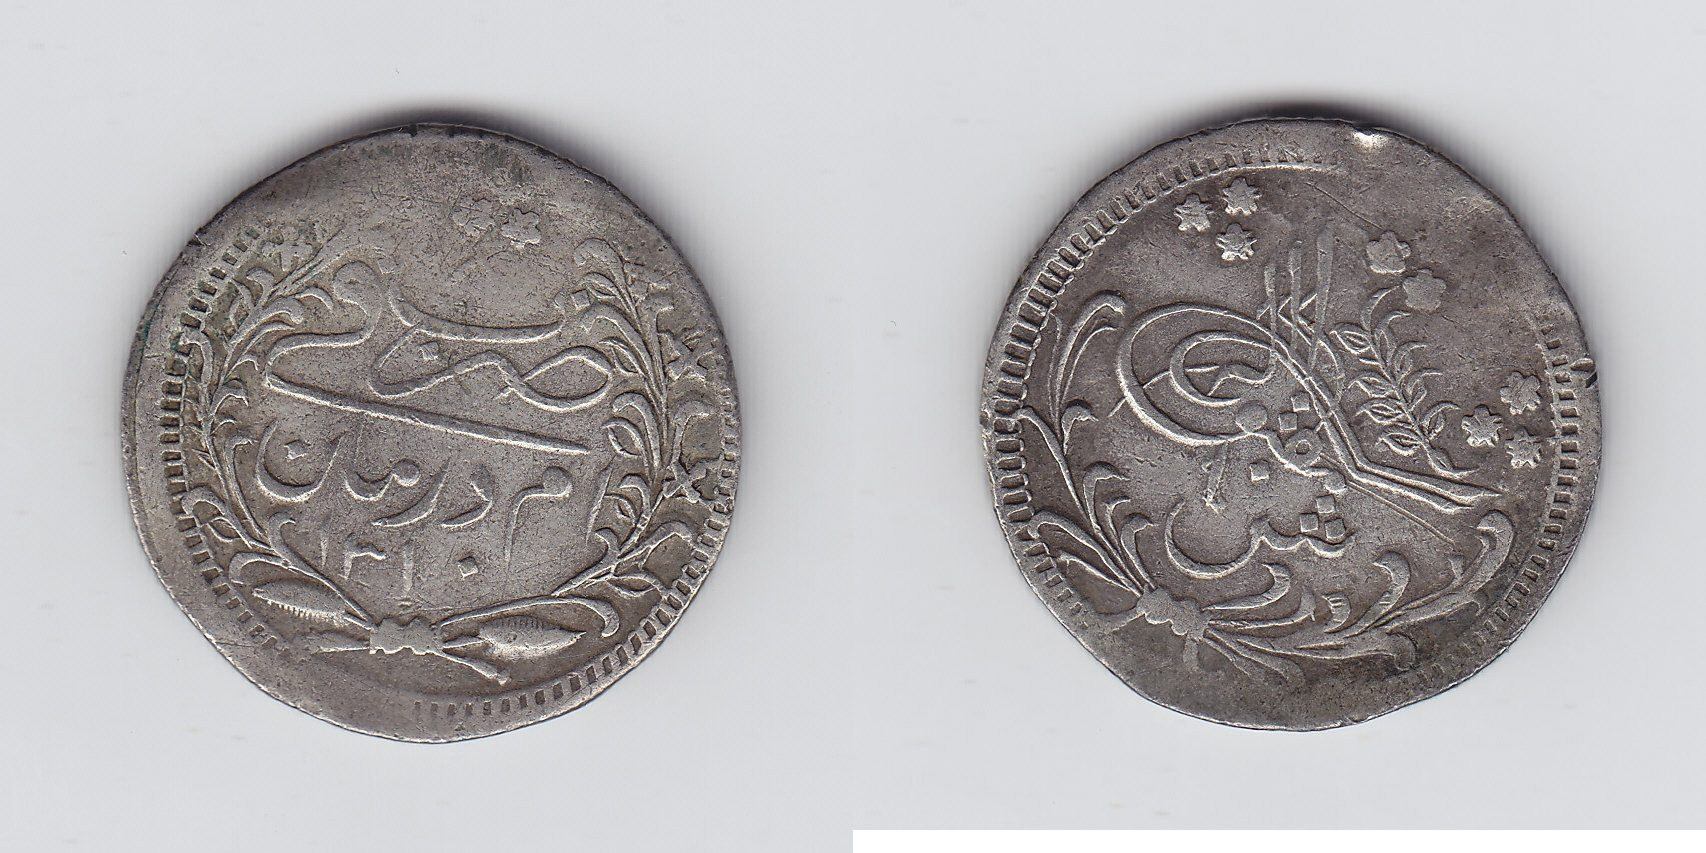 Sudan 10 Piaster 1310/8 ss